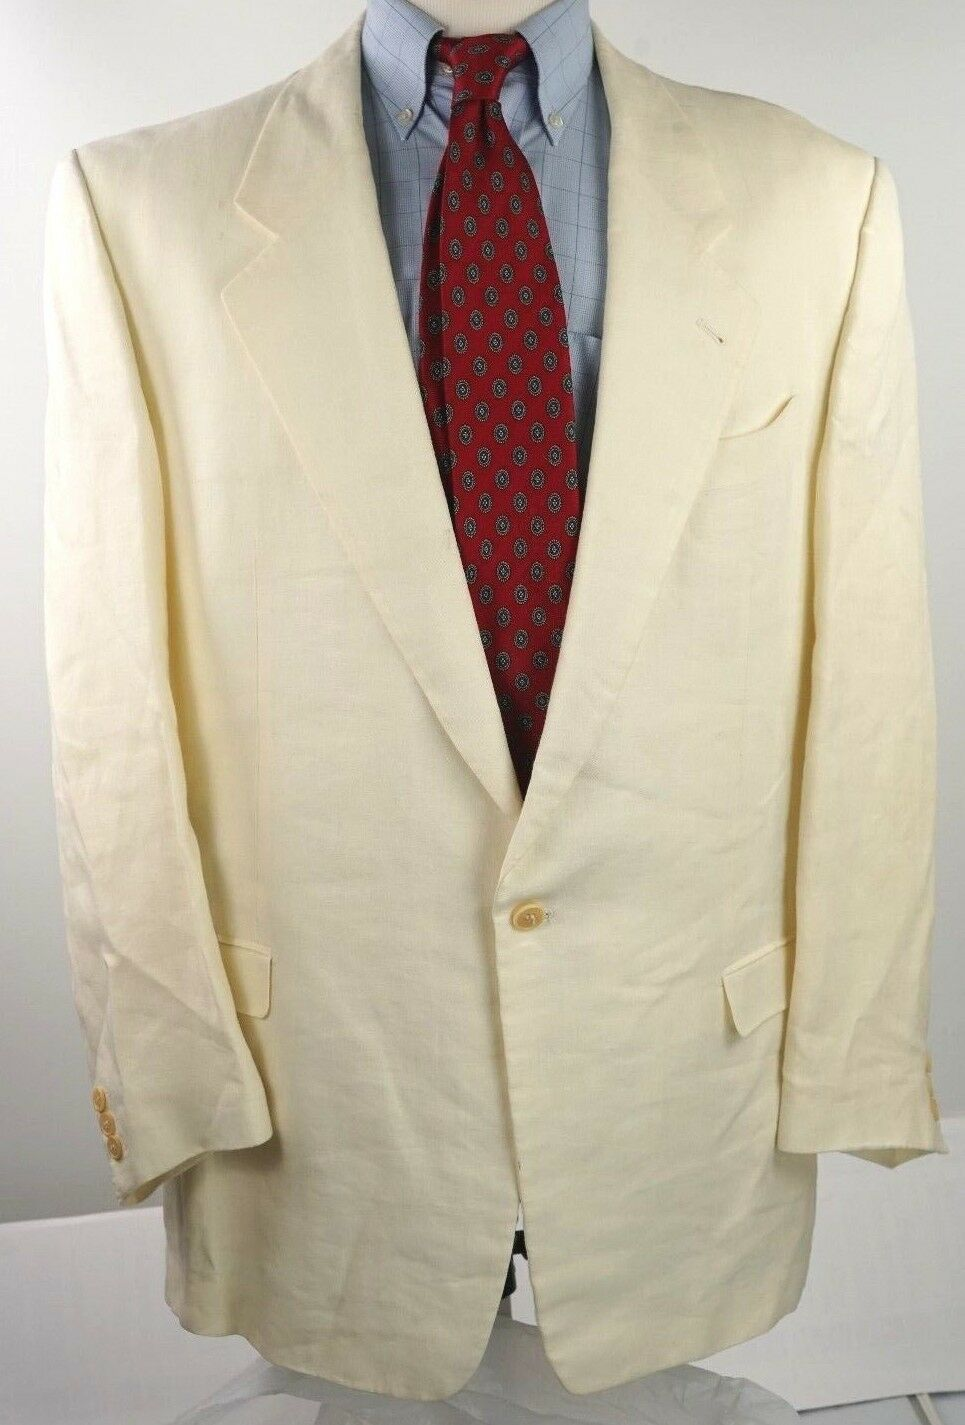 Pal Zileri   Herren Cream Linen Summer Sport Coat Blazer Größe EU 52 US 42R